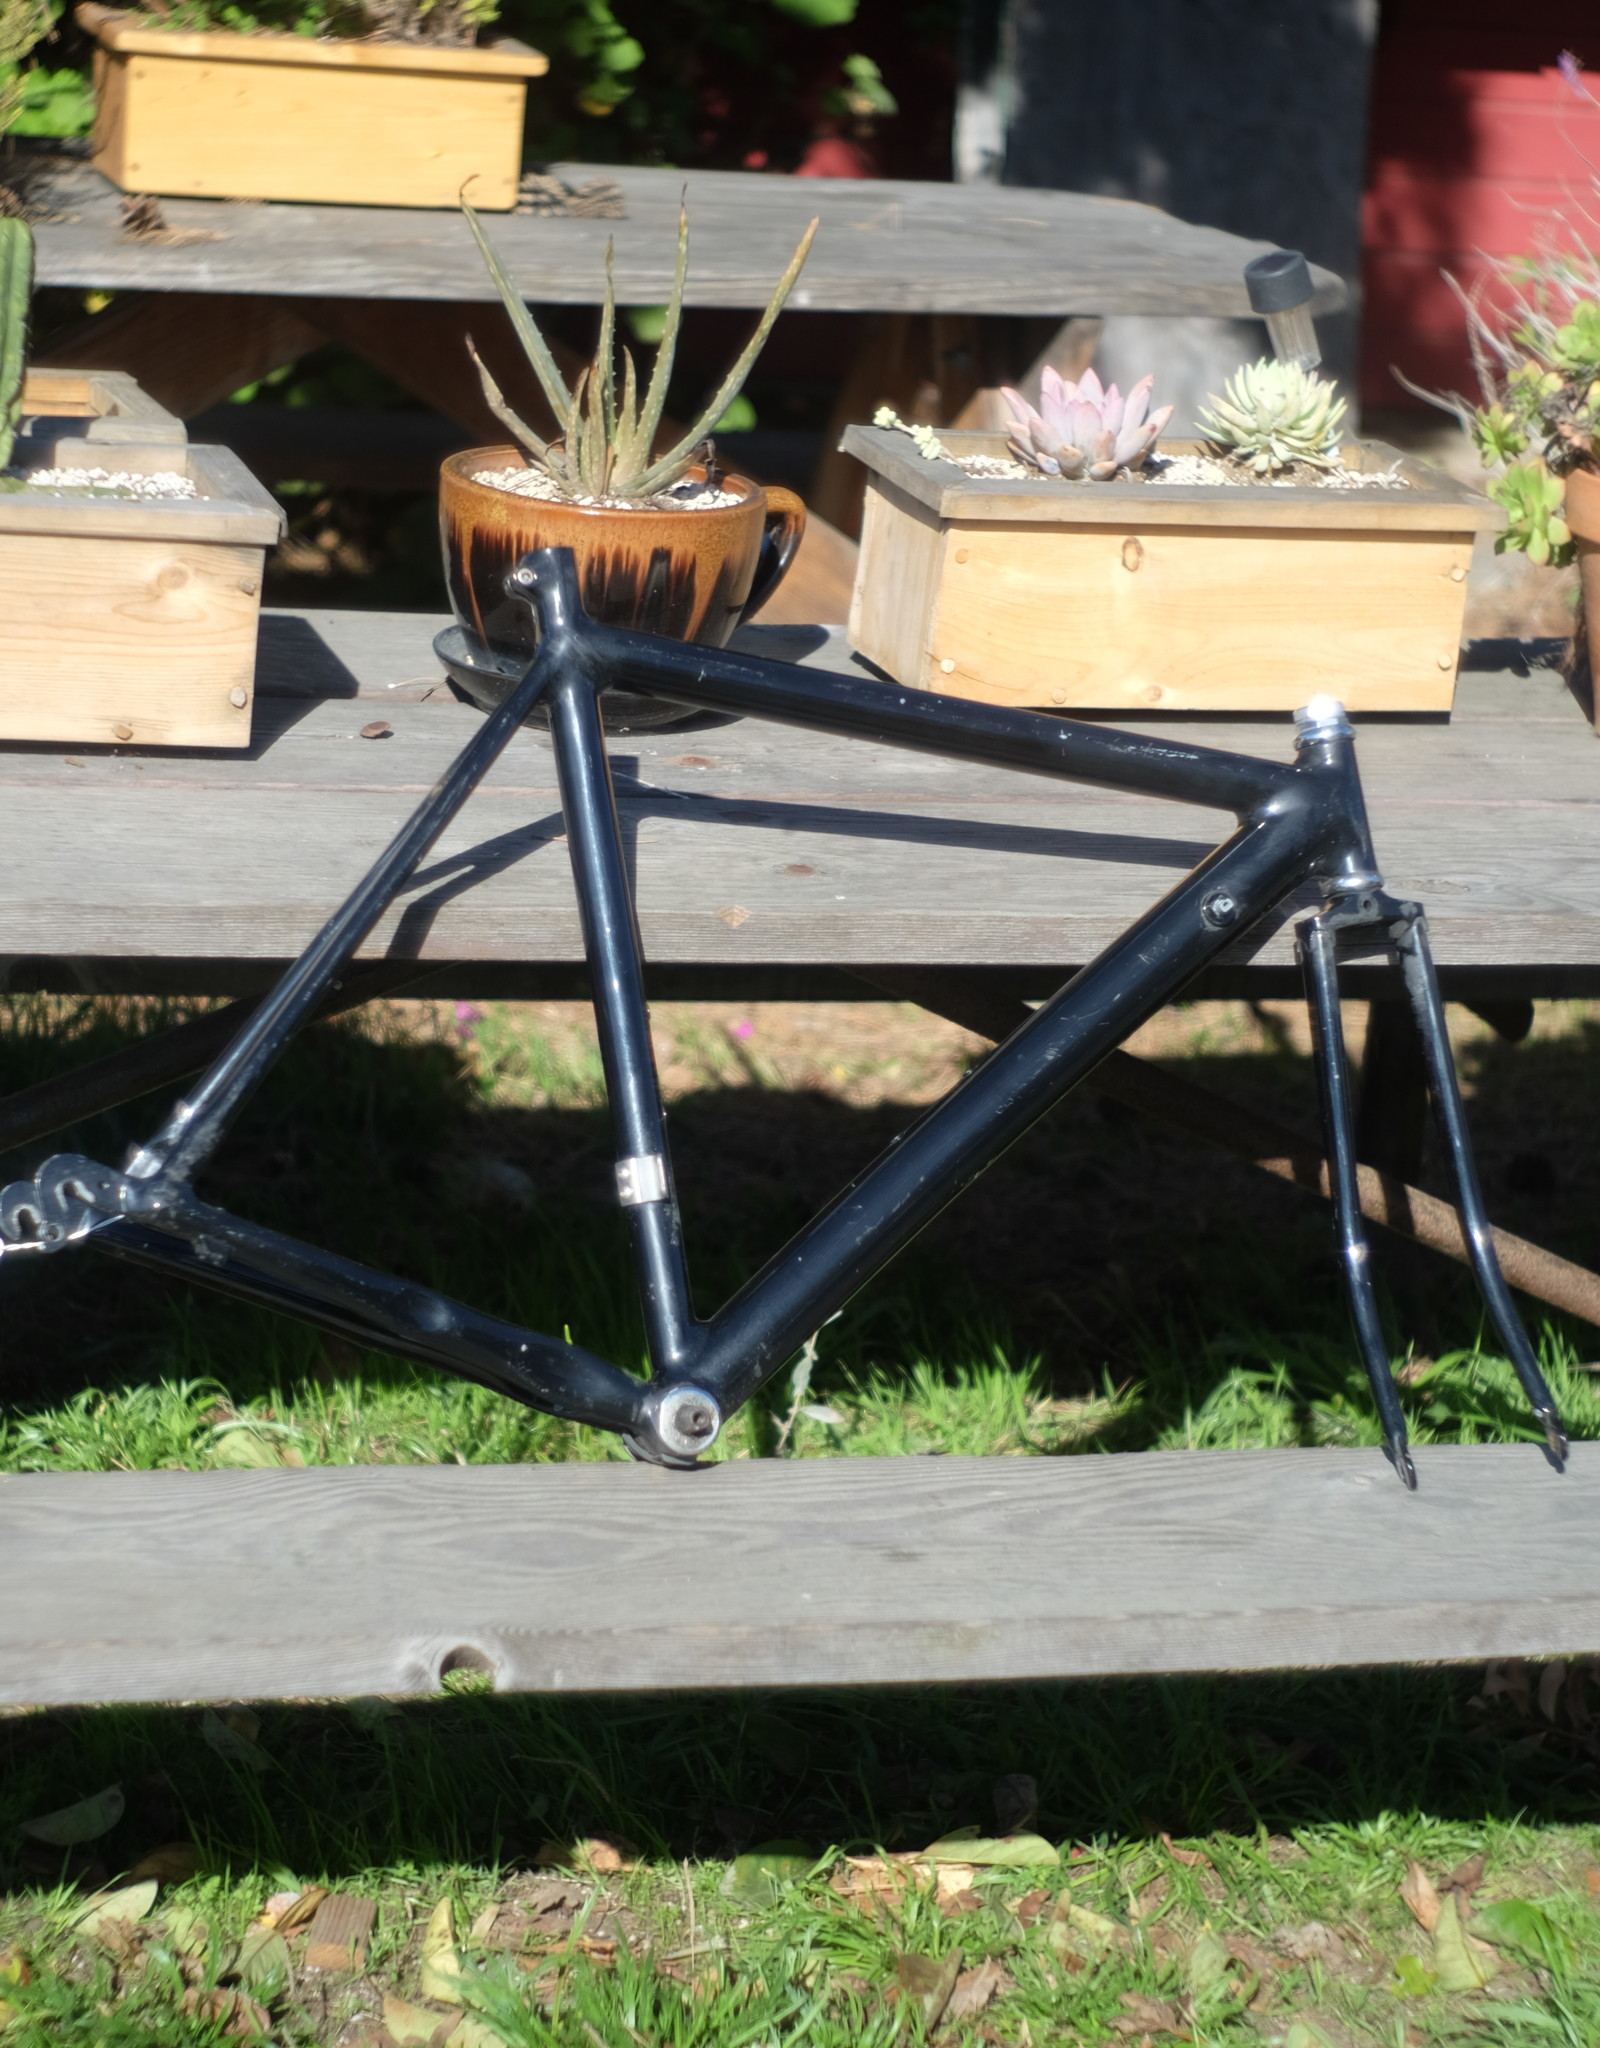 Aluminum Mountain Frame - 21.5in